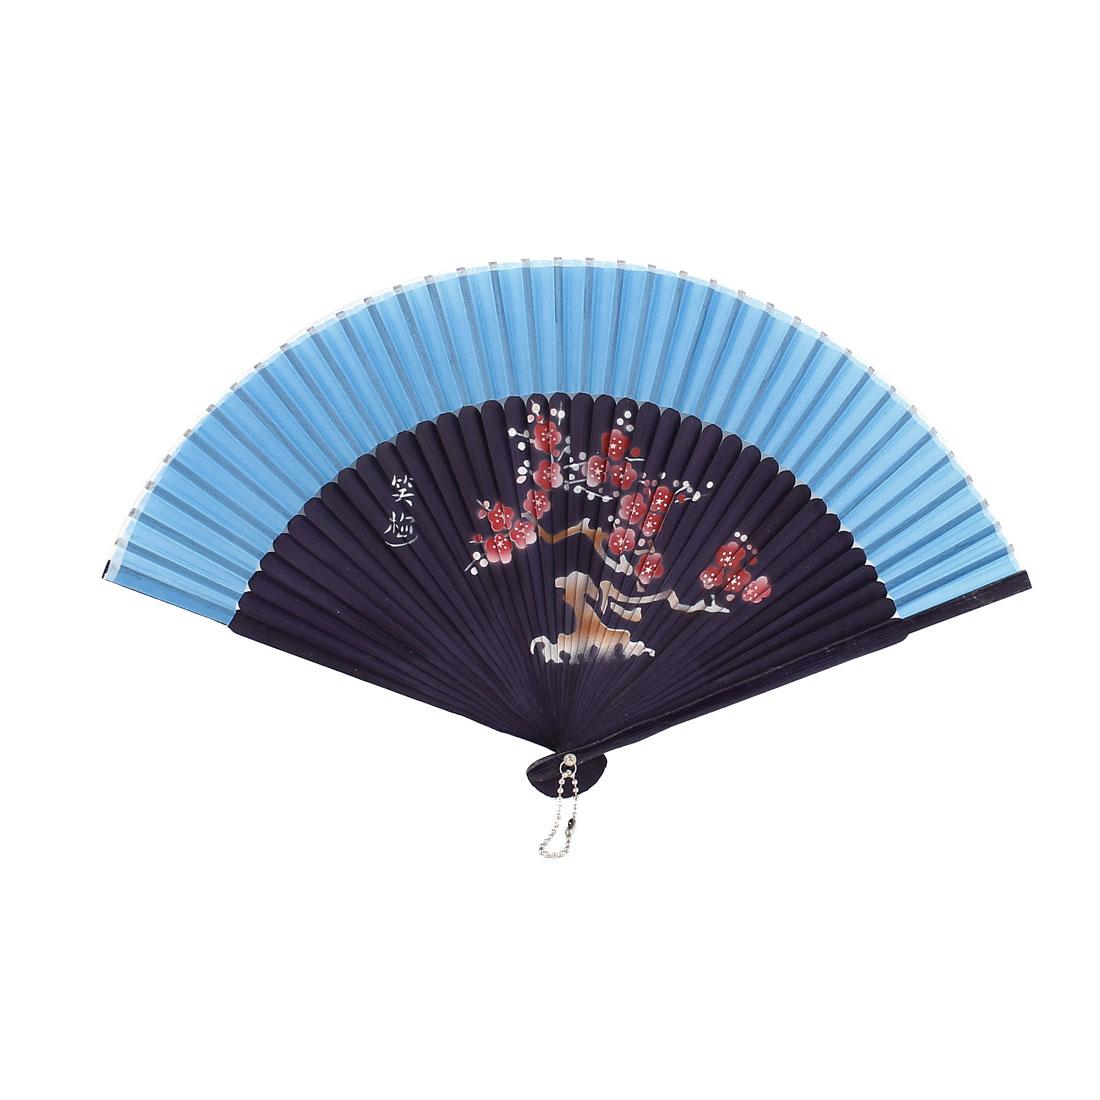 Blue Fabric Plum Blossom Printed Party Wedding Dancing Folded Hand Fan